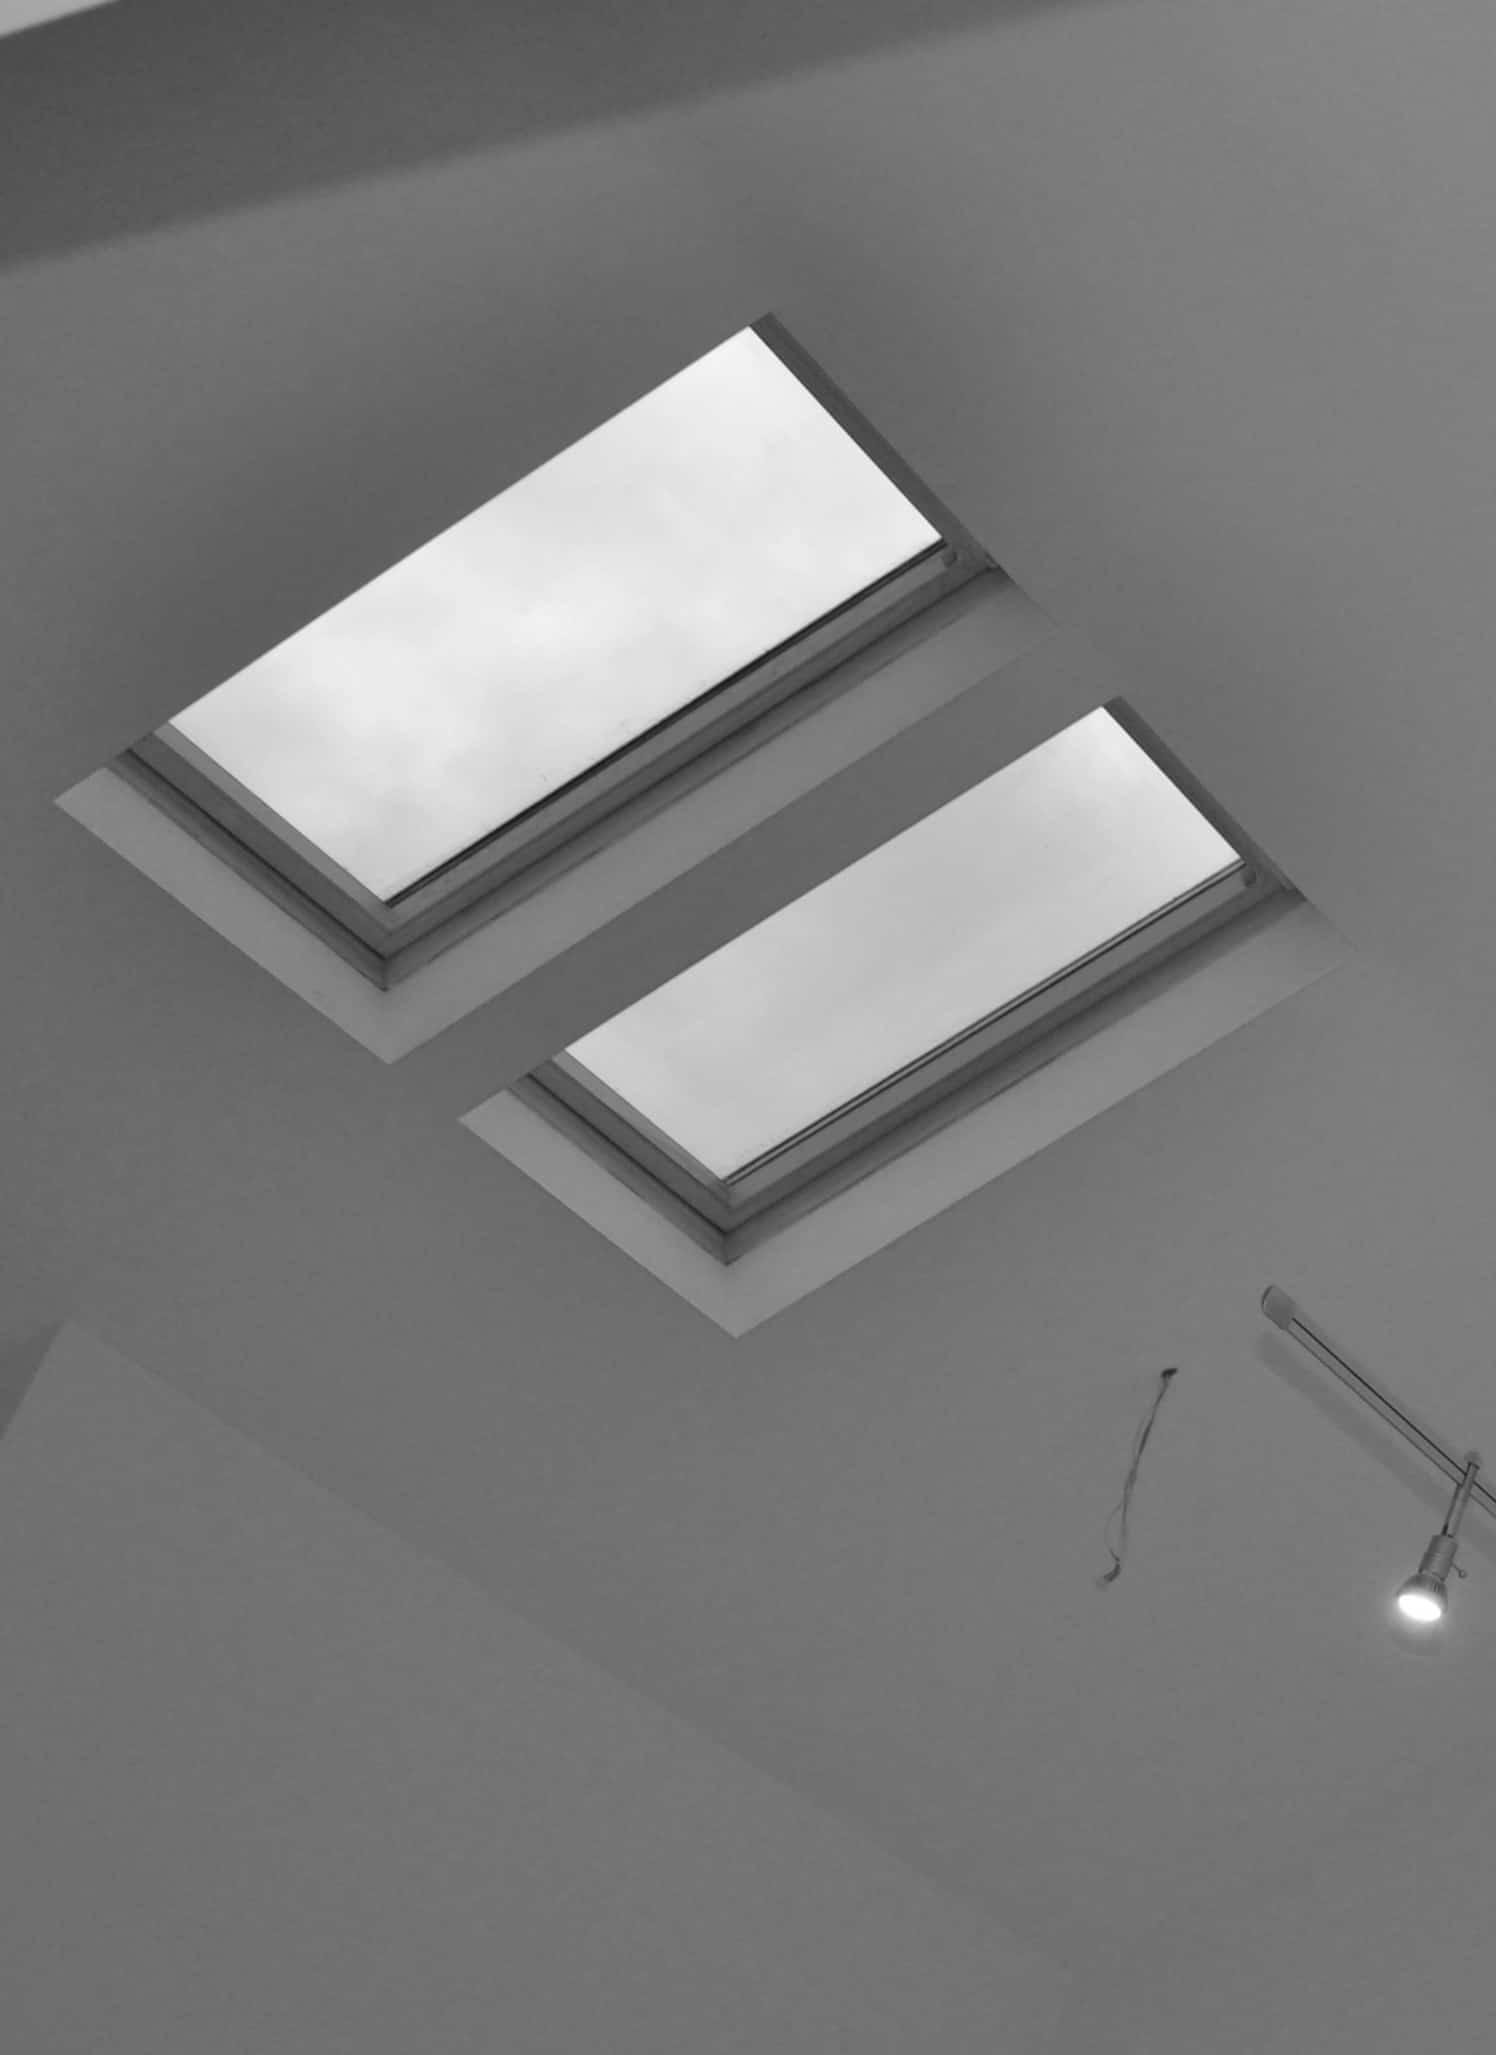 Quigg Dwelling - Roof Windows